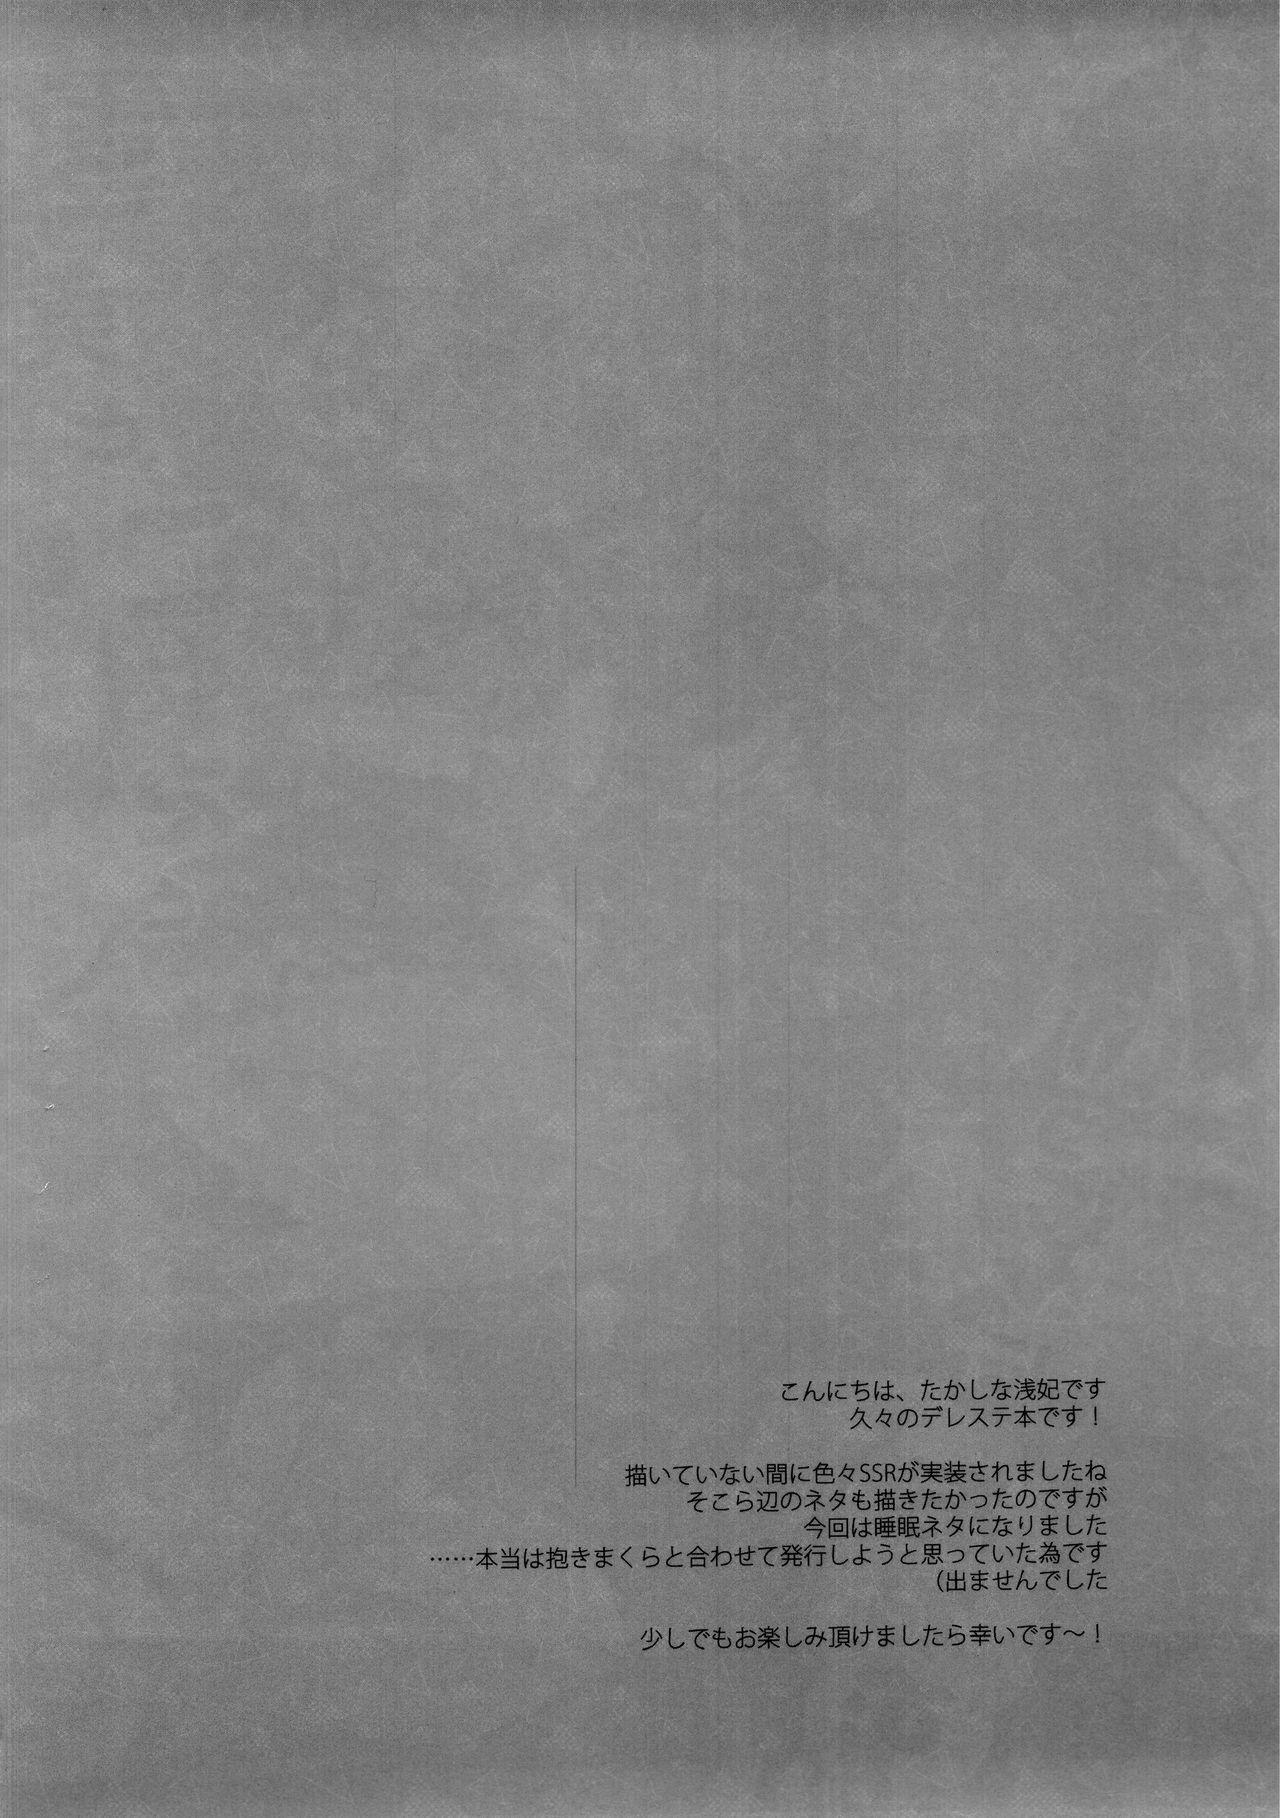 Yukimi to Kozue to Issho ni Onemu 2